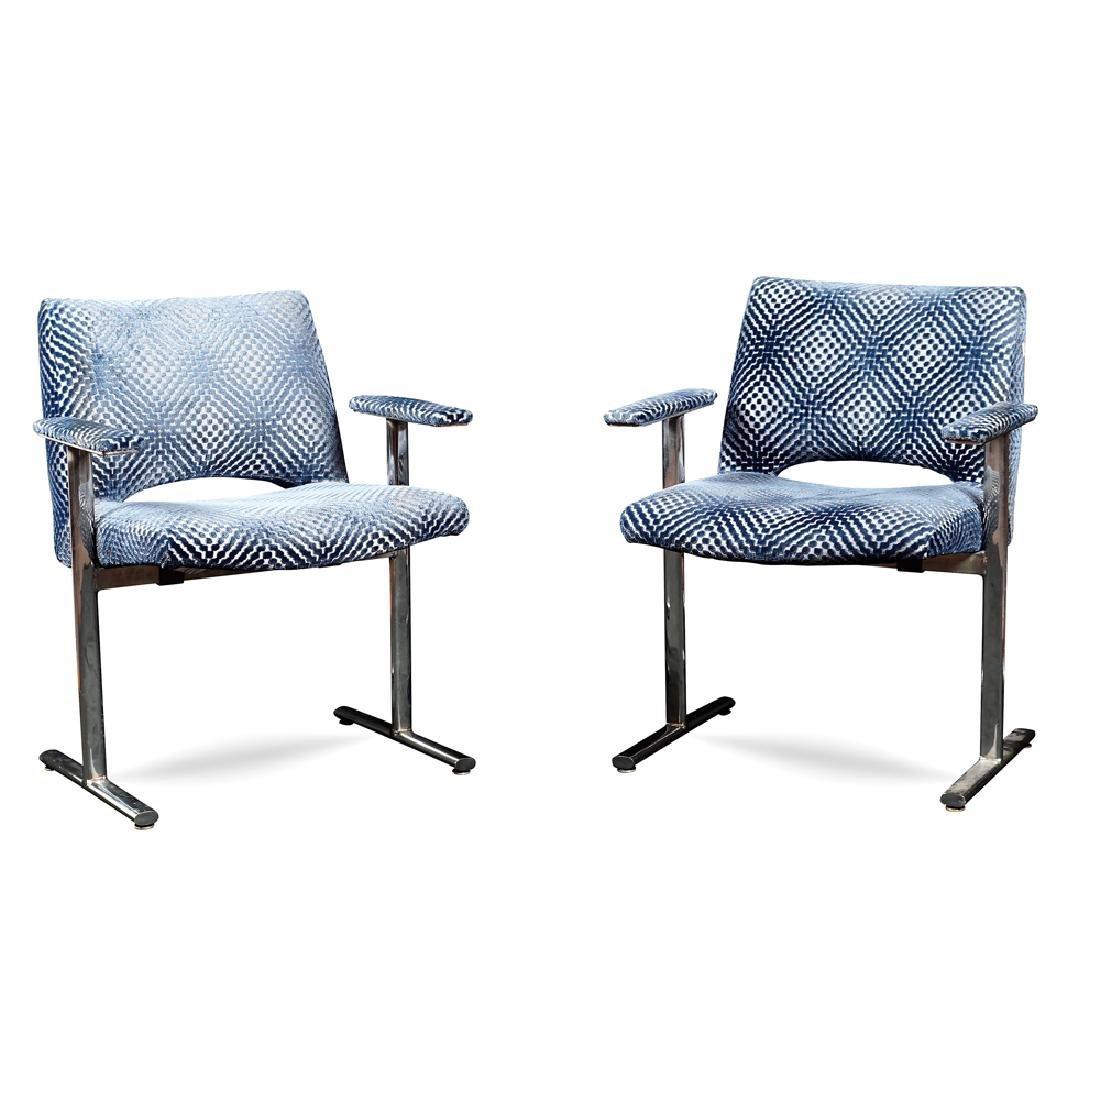 Pair of design armchairs Italy 20th century